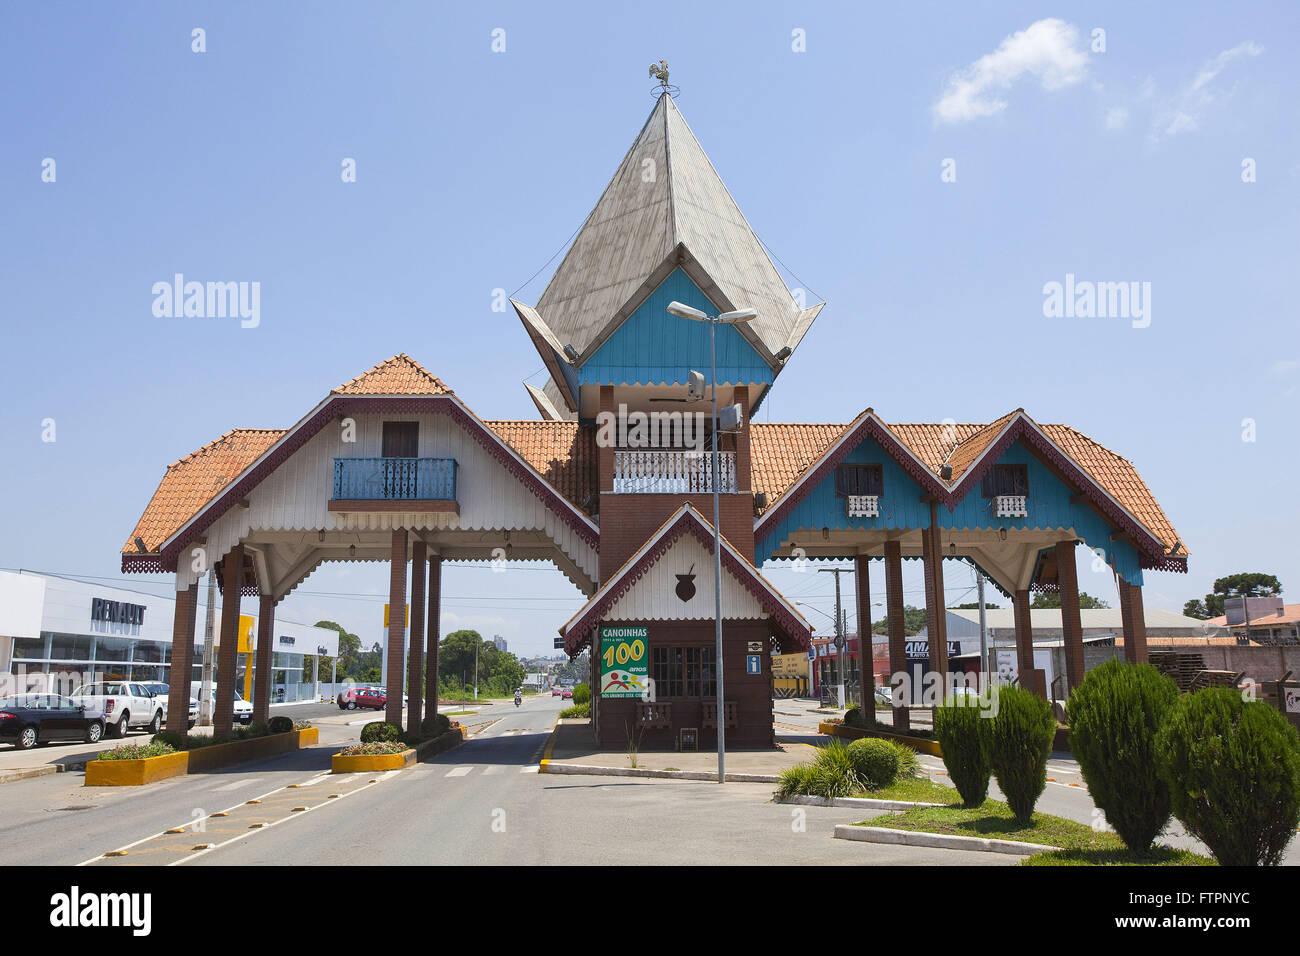 Portico visit the city built in the Slavic style - predominant colonization Stock Photo